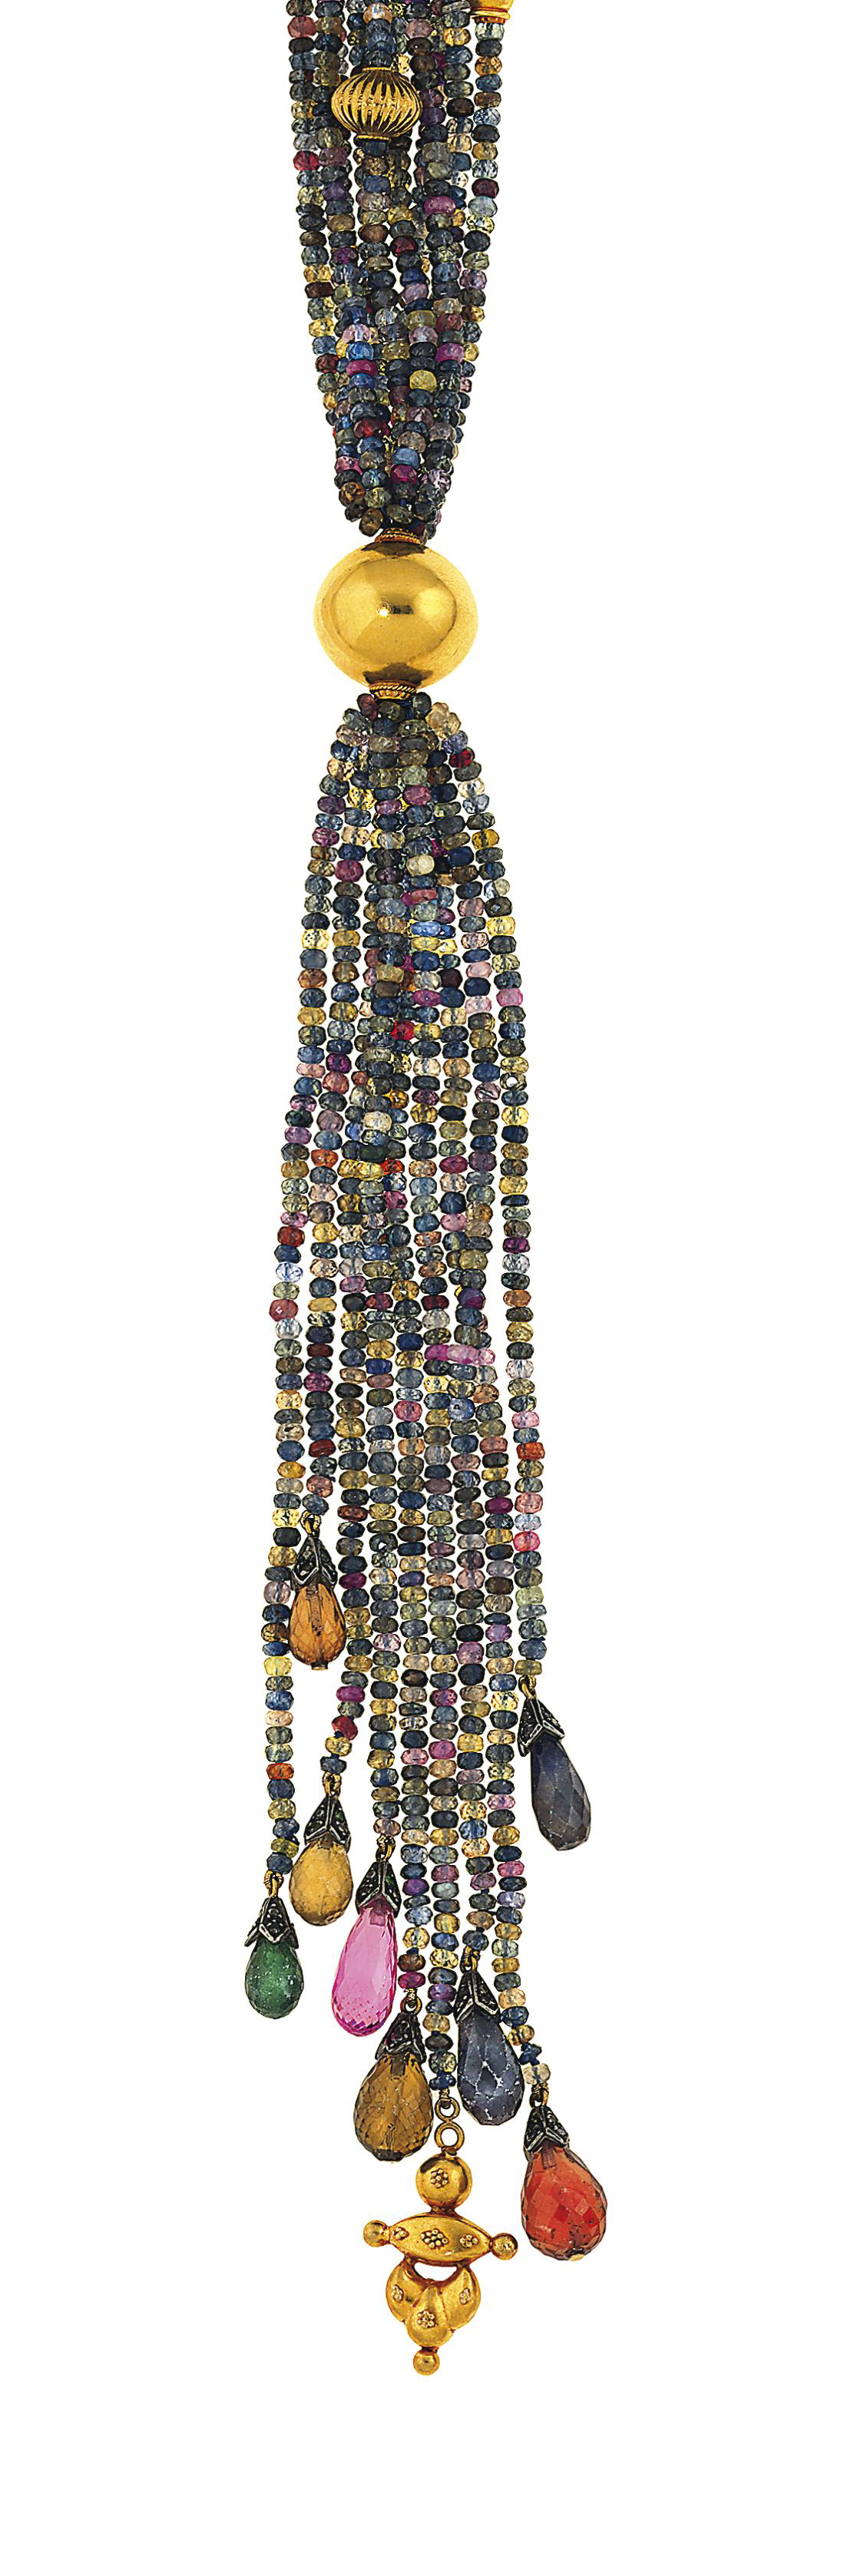 A vari-coloured sapphire sauto